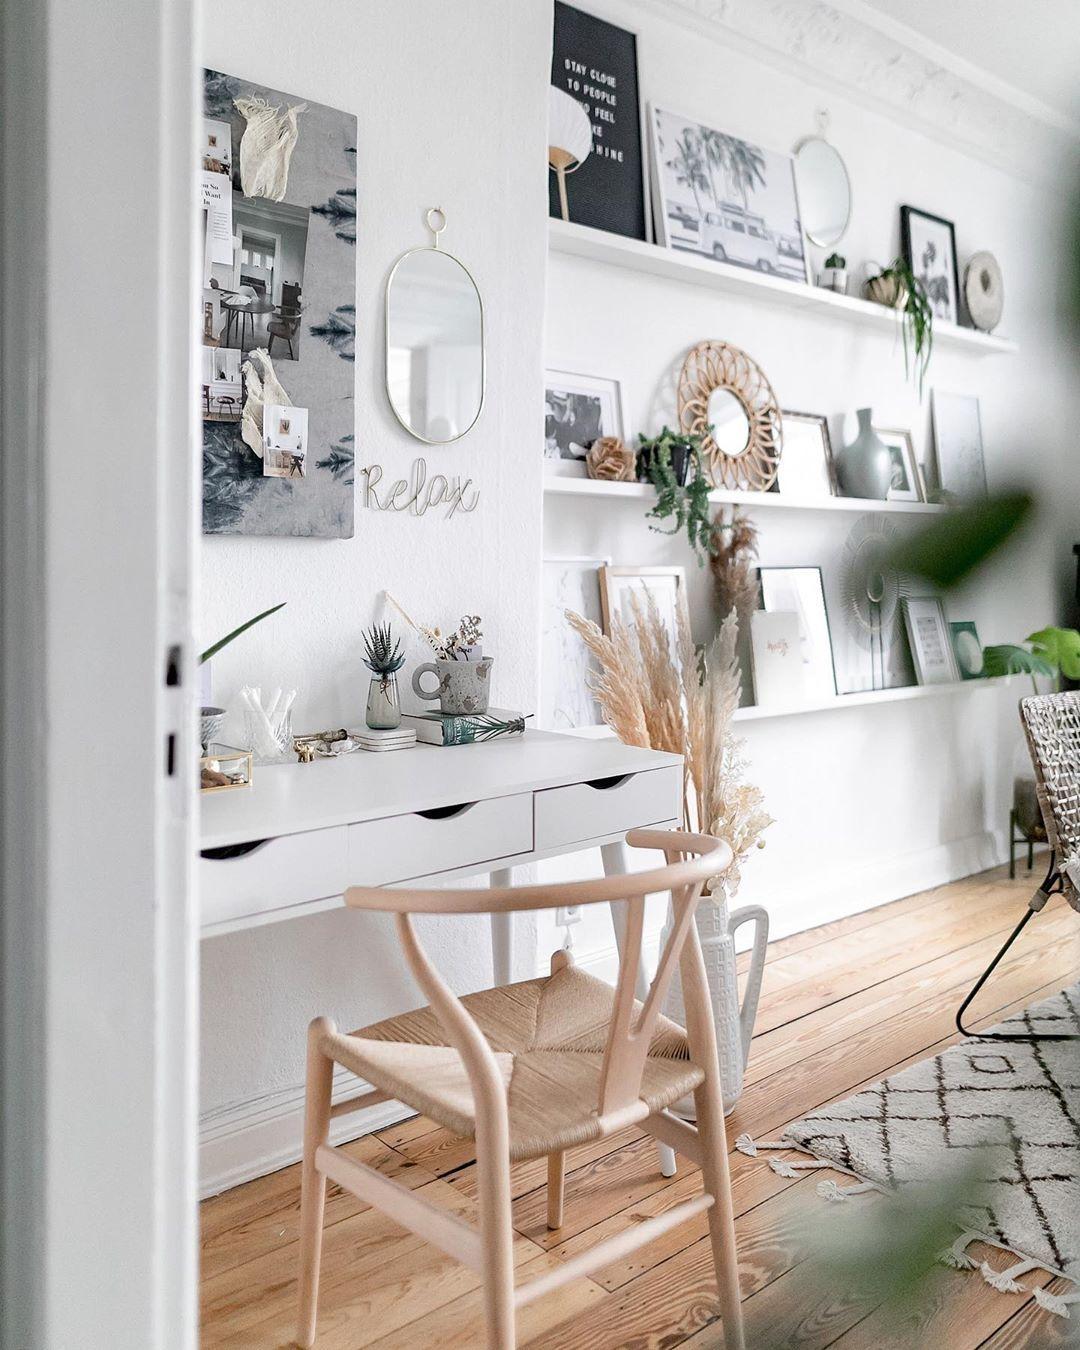 Full Size of Wanddeko Ideen Ldich In Der Community Inspirieren Küche Bad Renovieren Wohnzimmer Tapeten Wohnzimmer Wanddeko Ideen